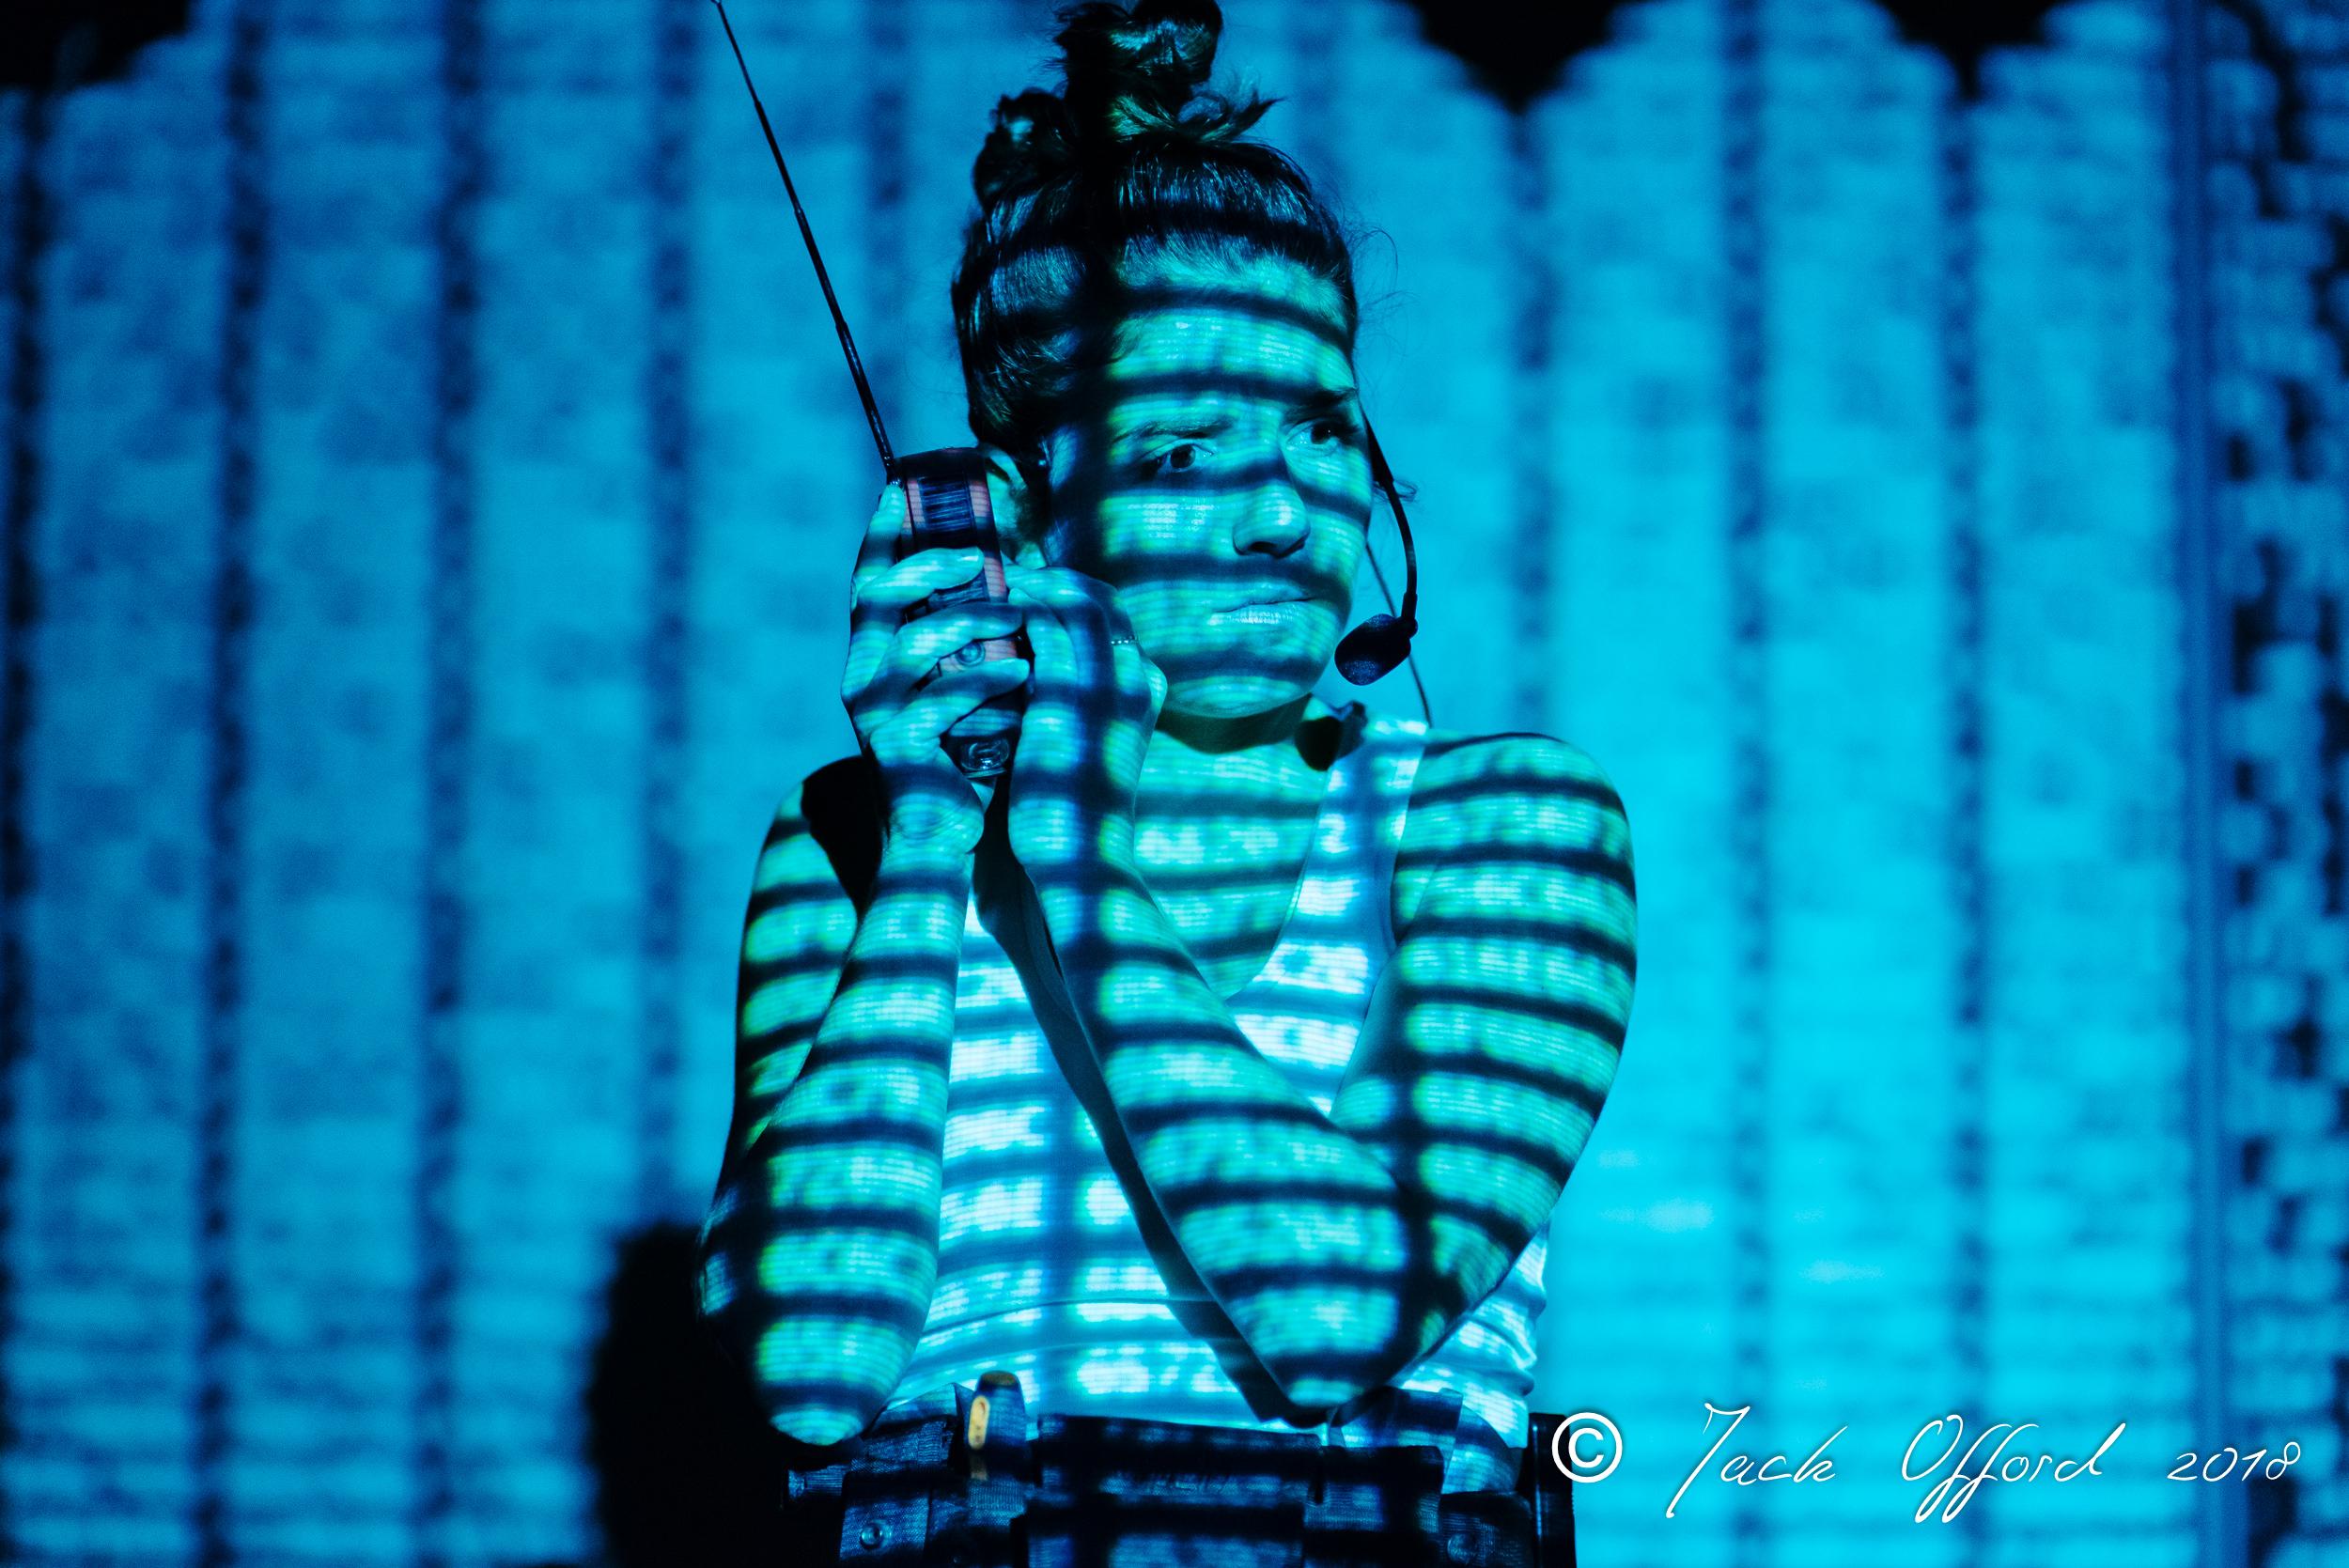 BOV Ferment Forrnight Jan 2018 - Psychopomp by Fen (Photographer Jack Offord) - Low Res (w)-0028.jpg